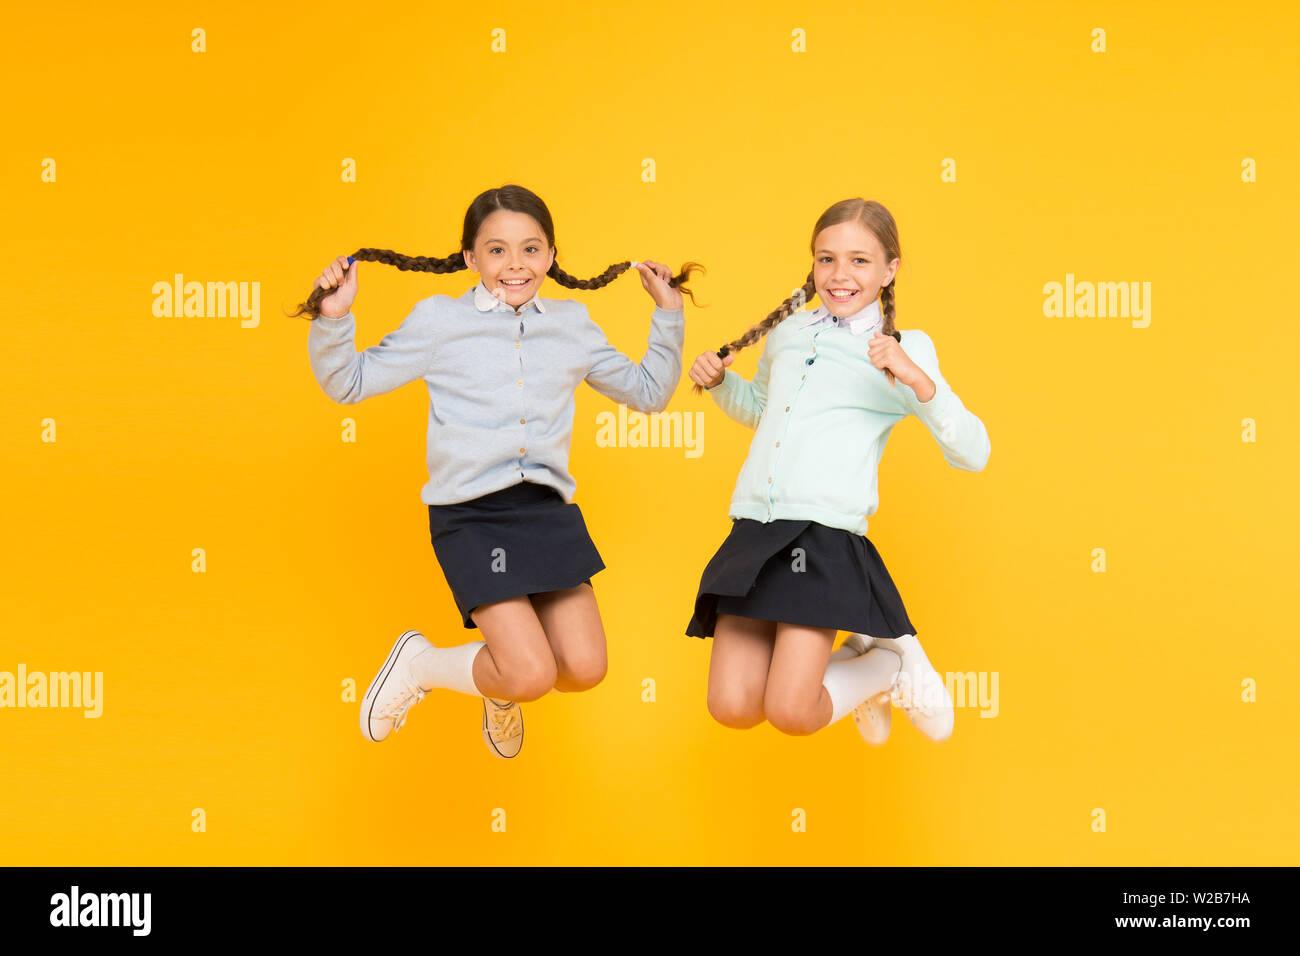 Secondary school. Kids cute students. Schoolgirls best friends excellent pupils. Schoolgirls tidy appearance school uniform. School friendship. Knowledge day. School day fun cheerful moments. Stock Photo